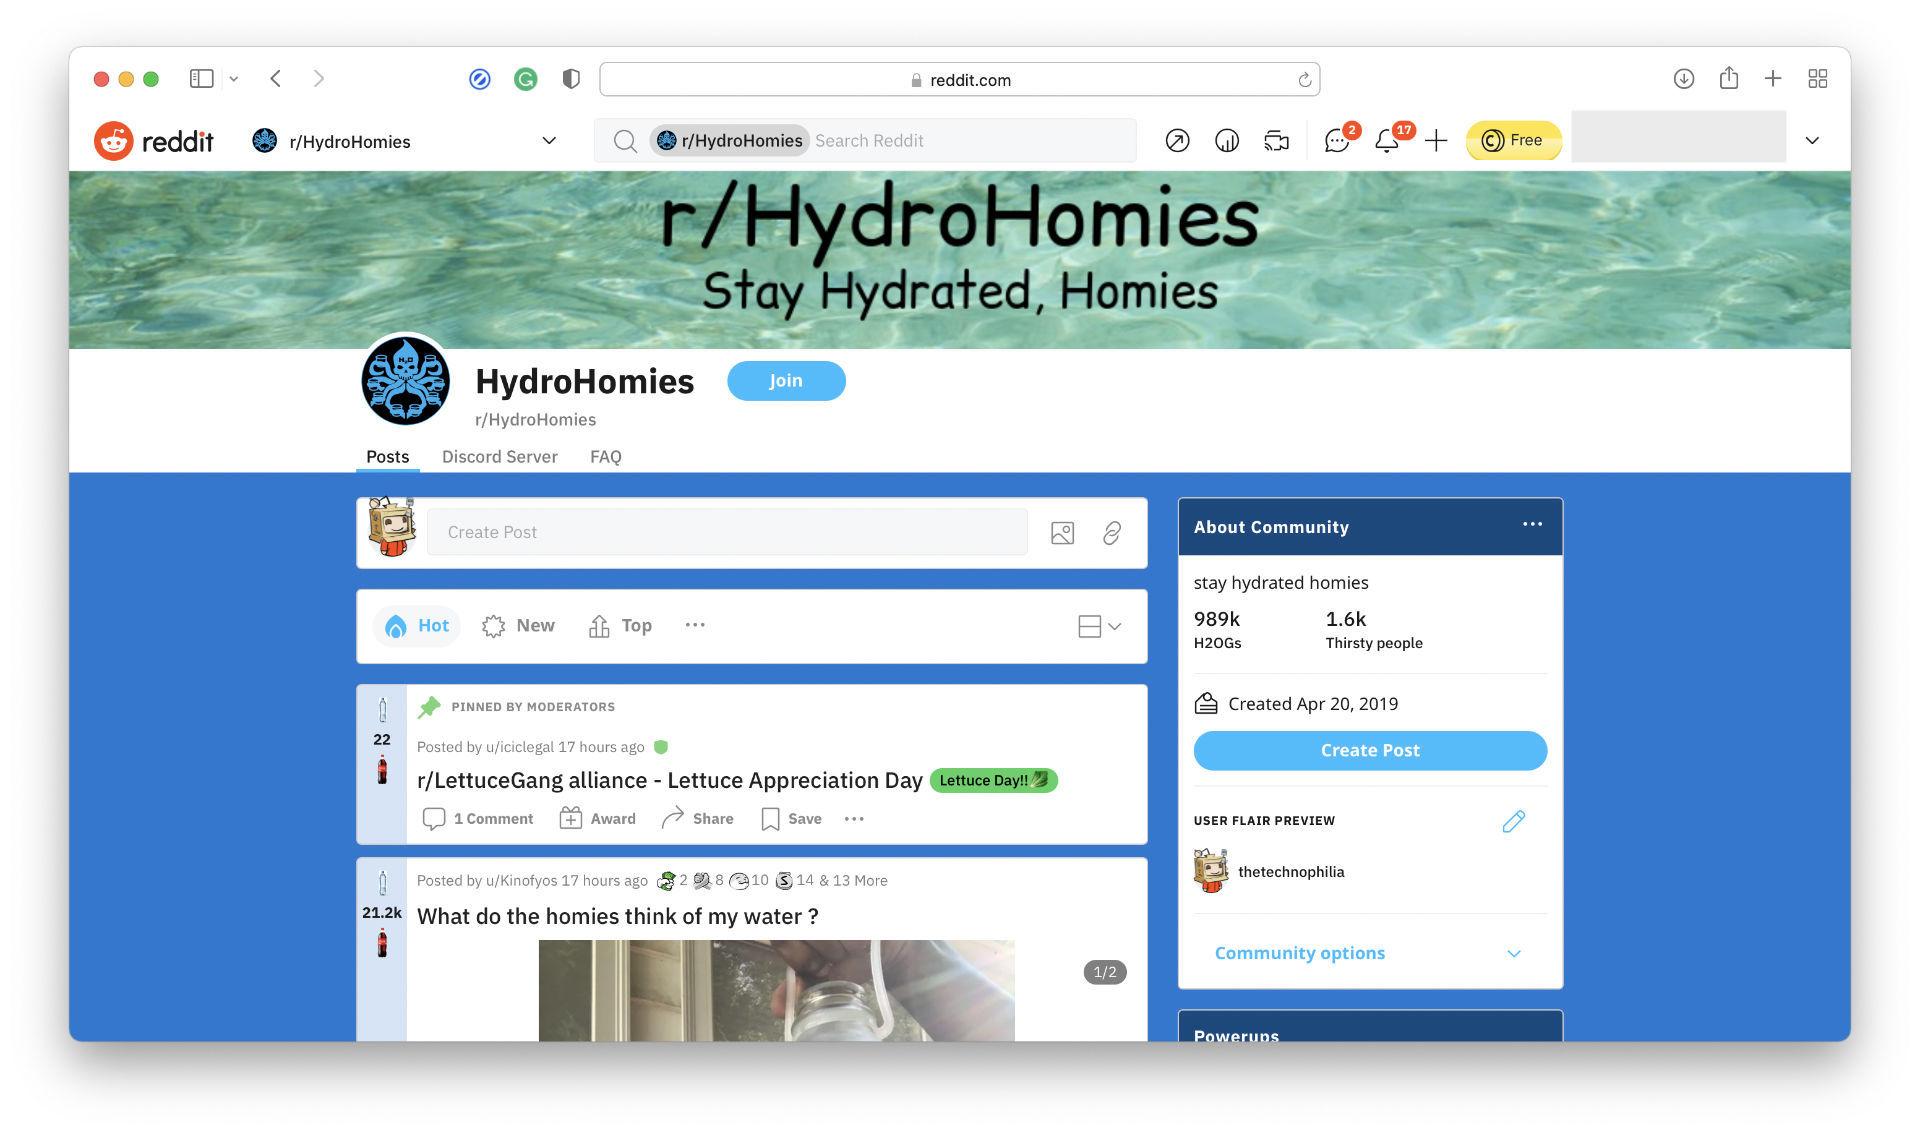 HydroHomies Subreddit